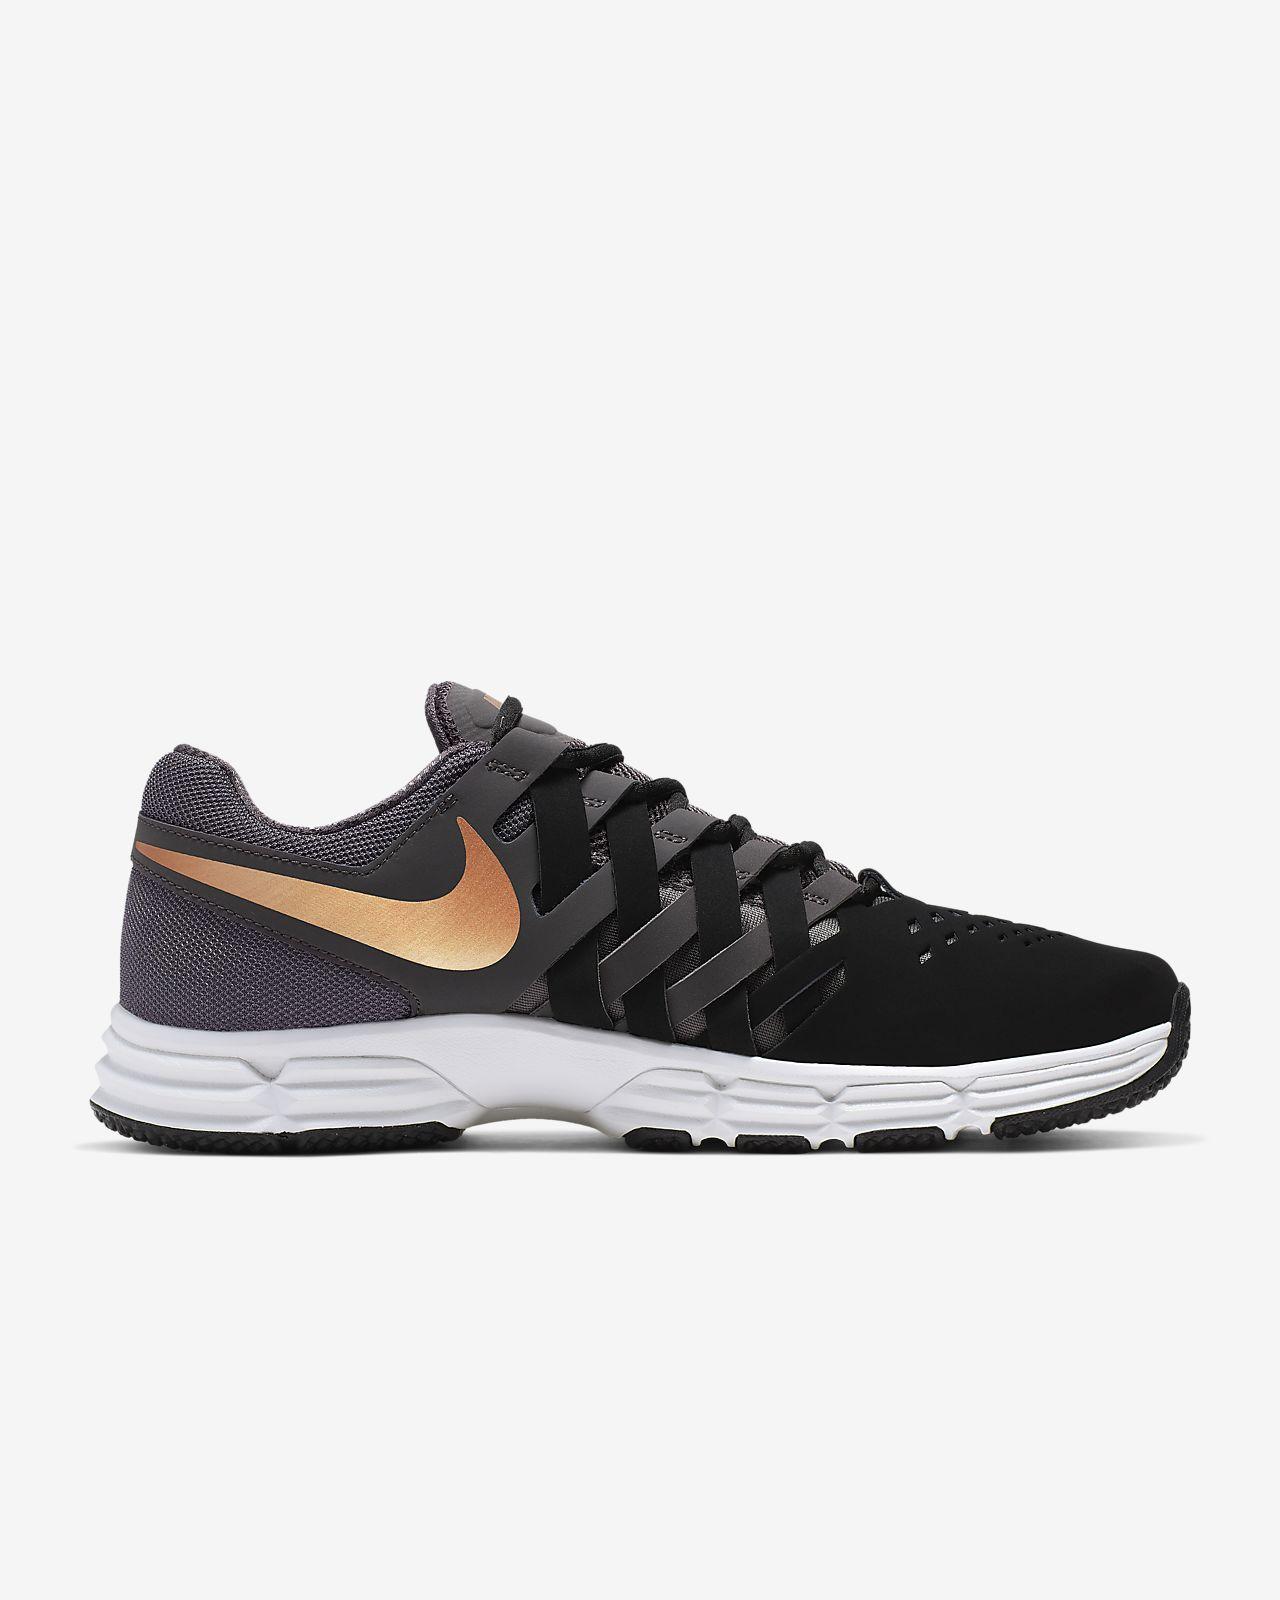 8f7a2c667b9 Nike Lunar Fingertrap TR Men's Gym/Gameday Shoe